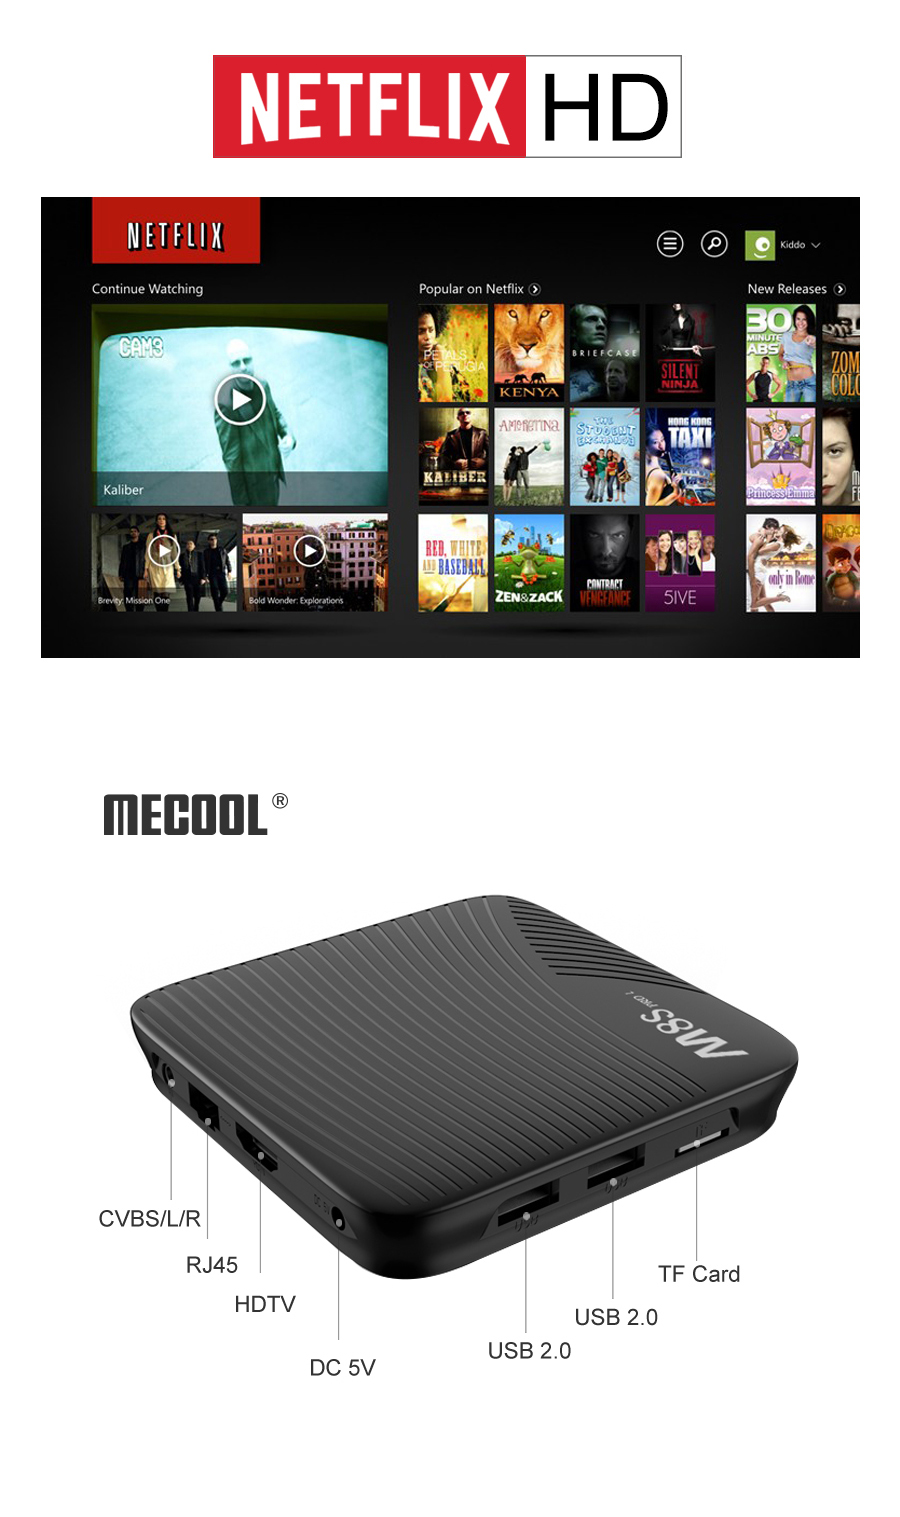 Mecool M8S Pro L Amlogic S912 3GB RAM 32GB ROM 5G WIFI bluetooth 4.1 4K Android TV Box Support HD Netflix 4K Youtube